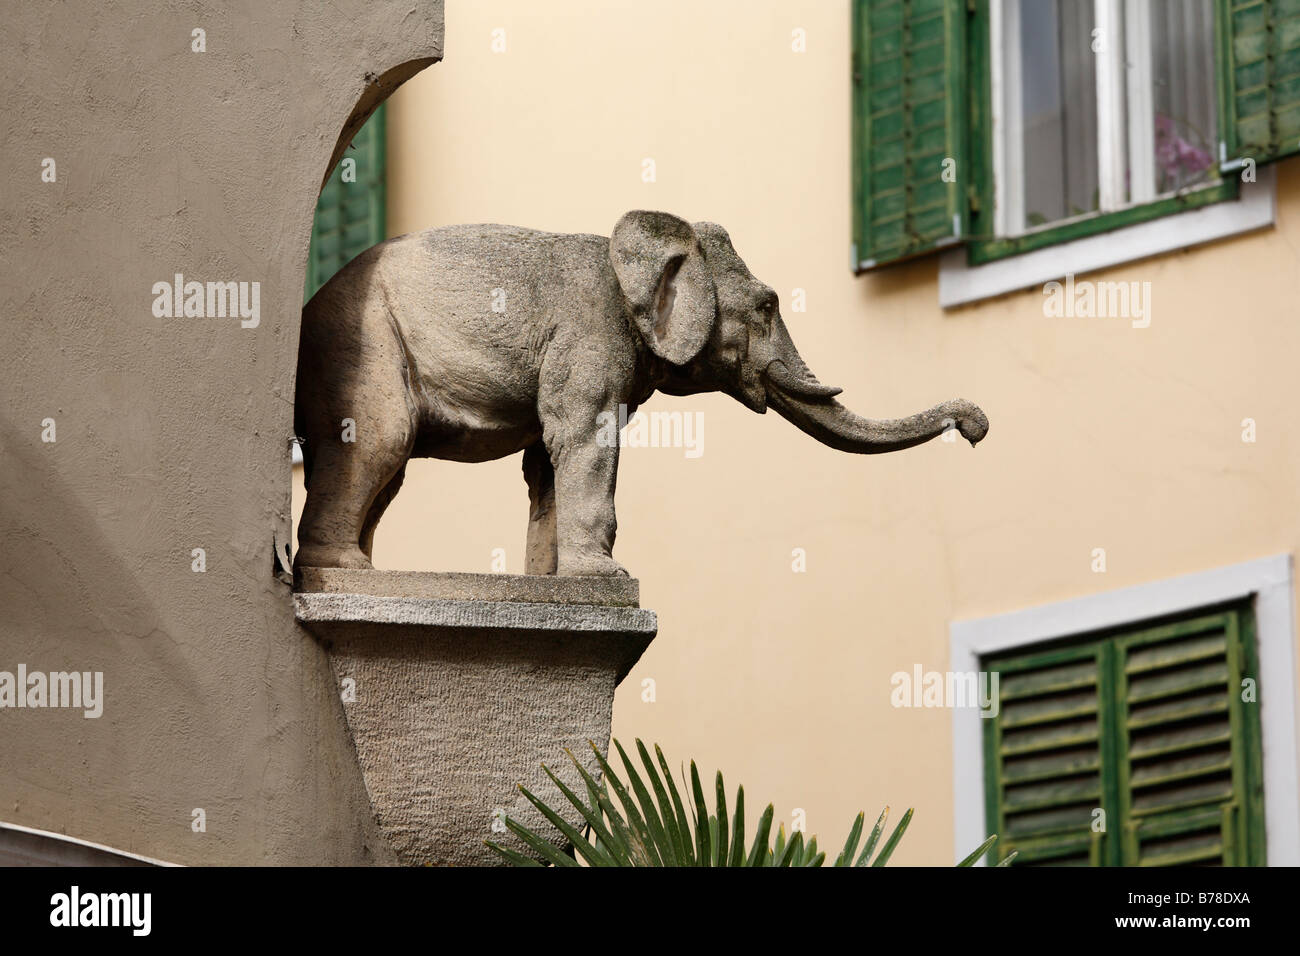 Stone elephant, historic city centre of Graz, Styria, Austria, Europe - Stock Image